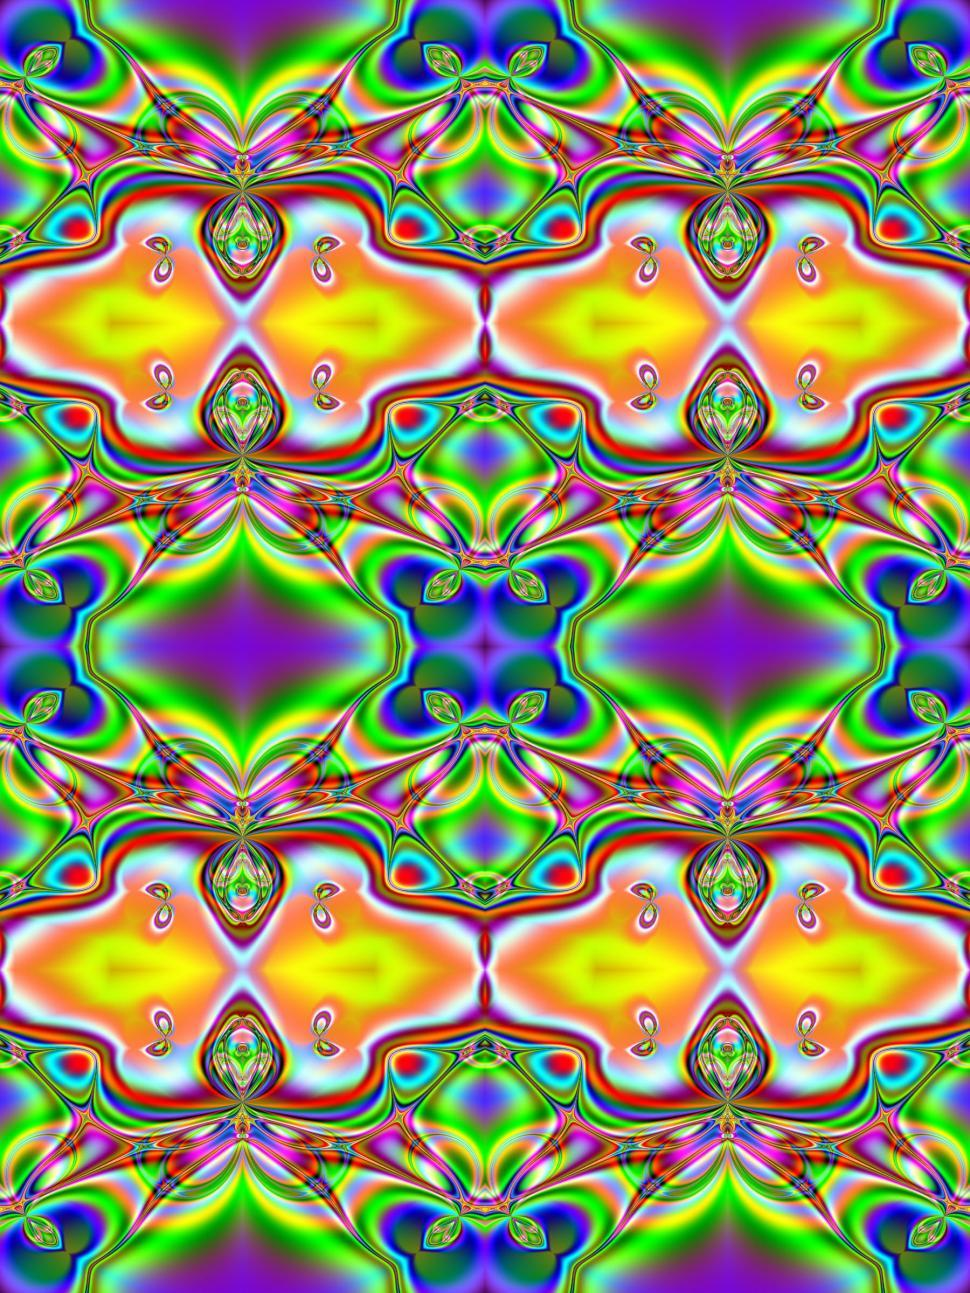 Download Free Stock HD Photo of Fractal-based Tile Online